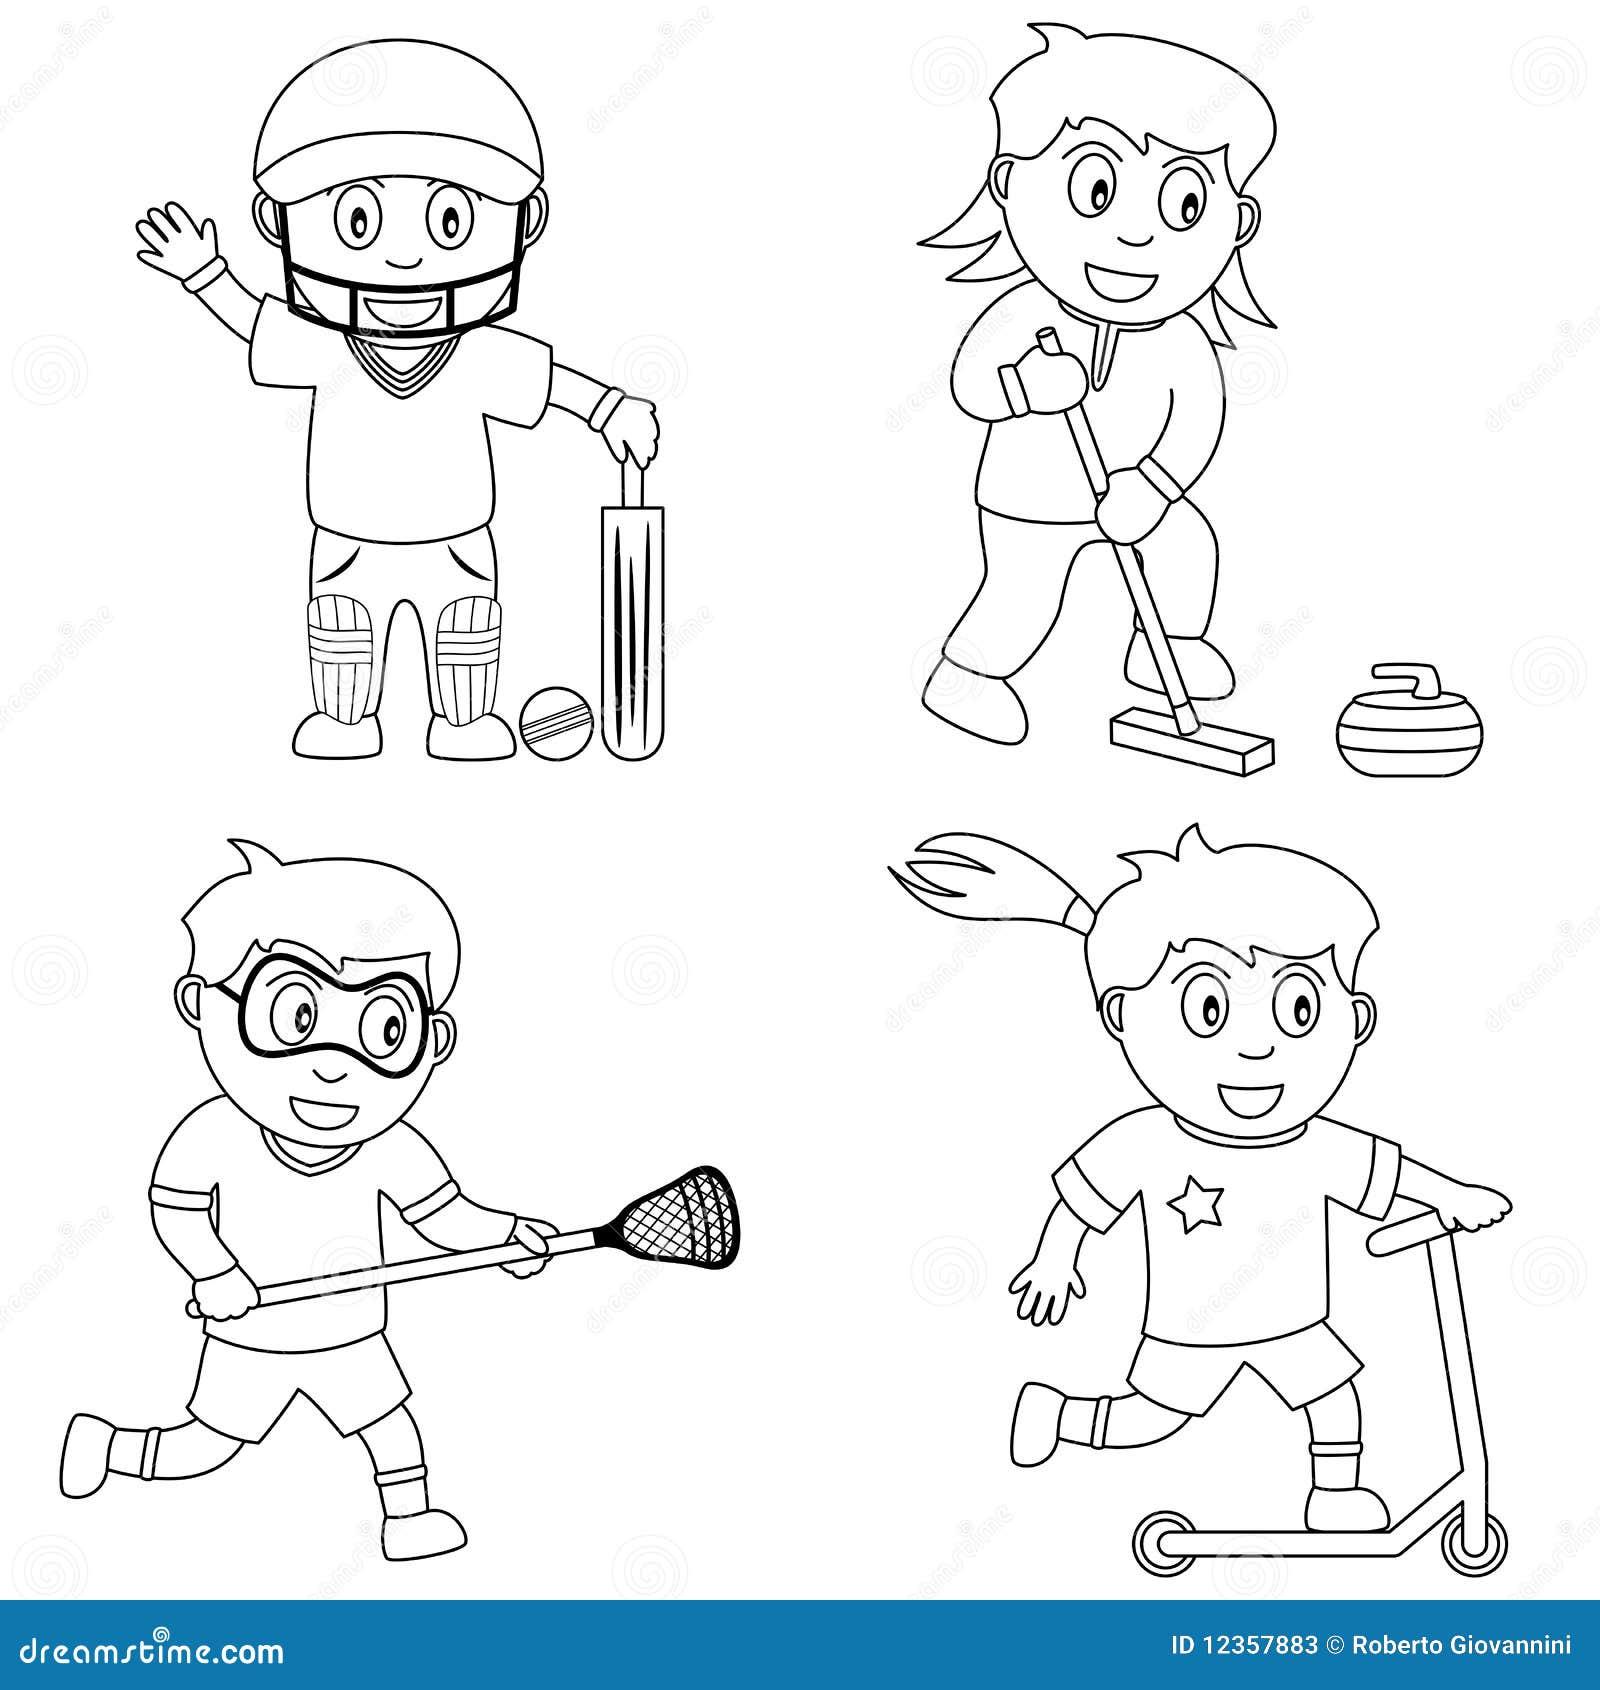 coloring sport for kids 6 stock vector illustration of child drawing 12357883. Black Bedroom Furniture Sets. Home Design Ideas